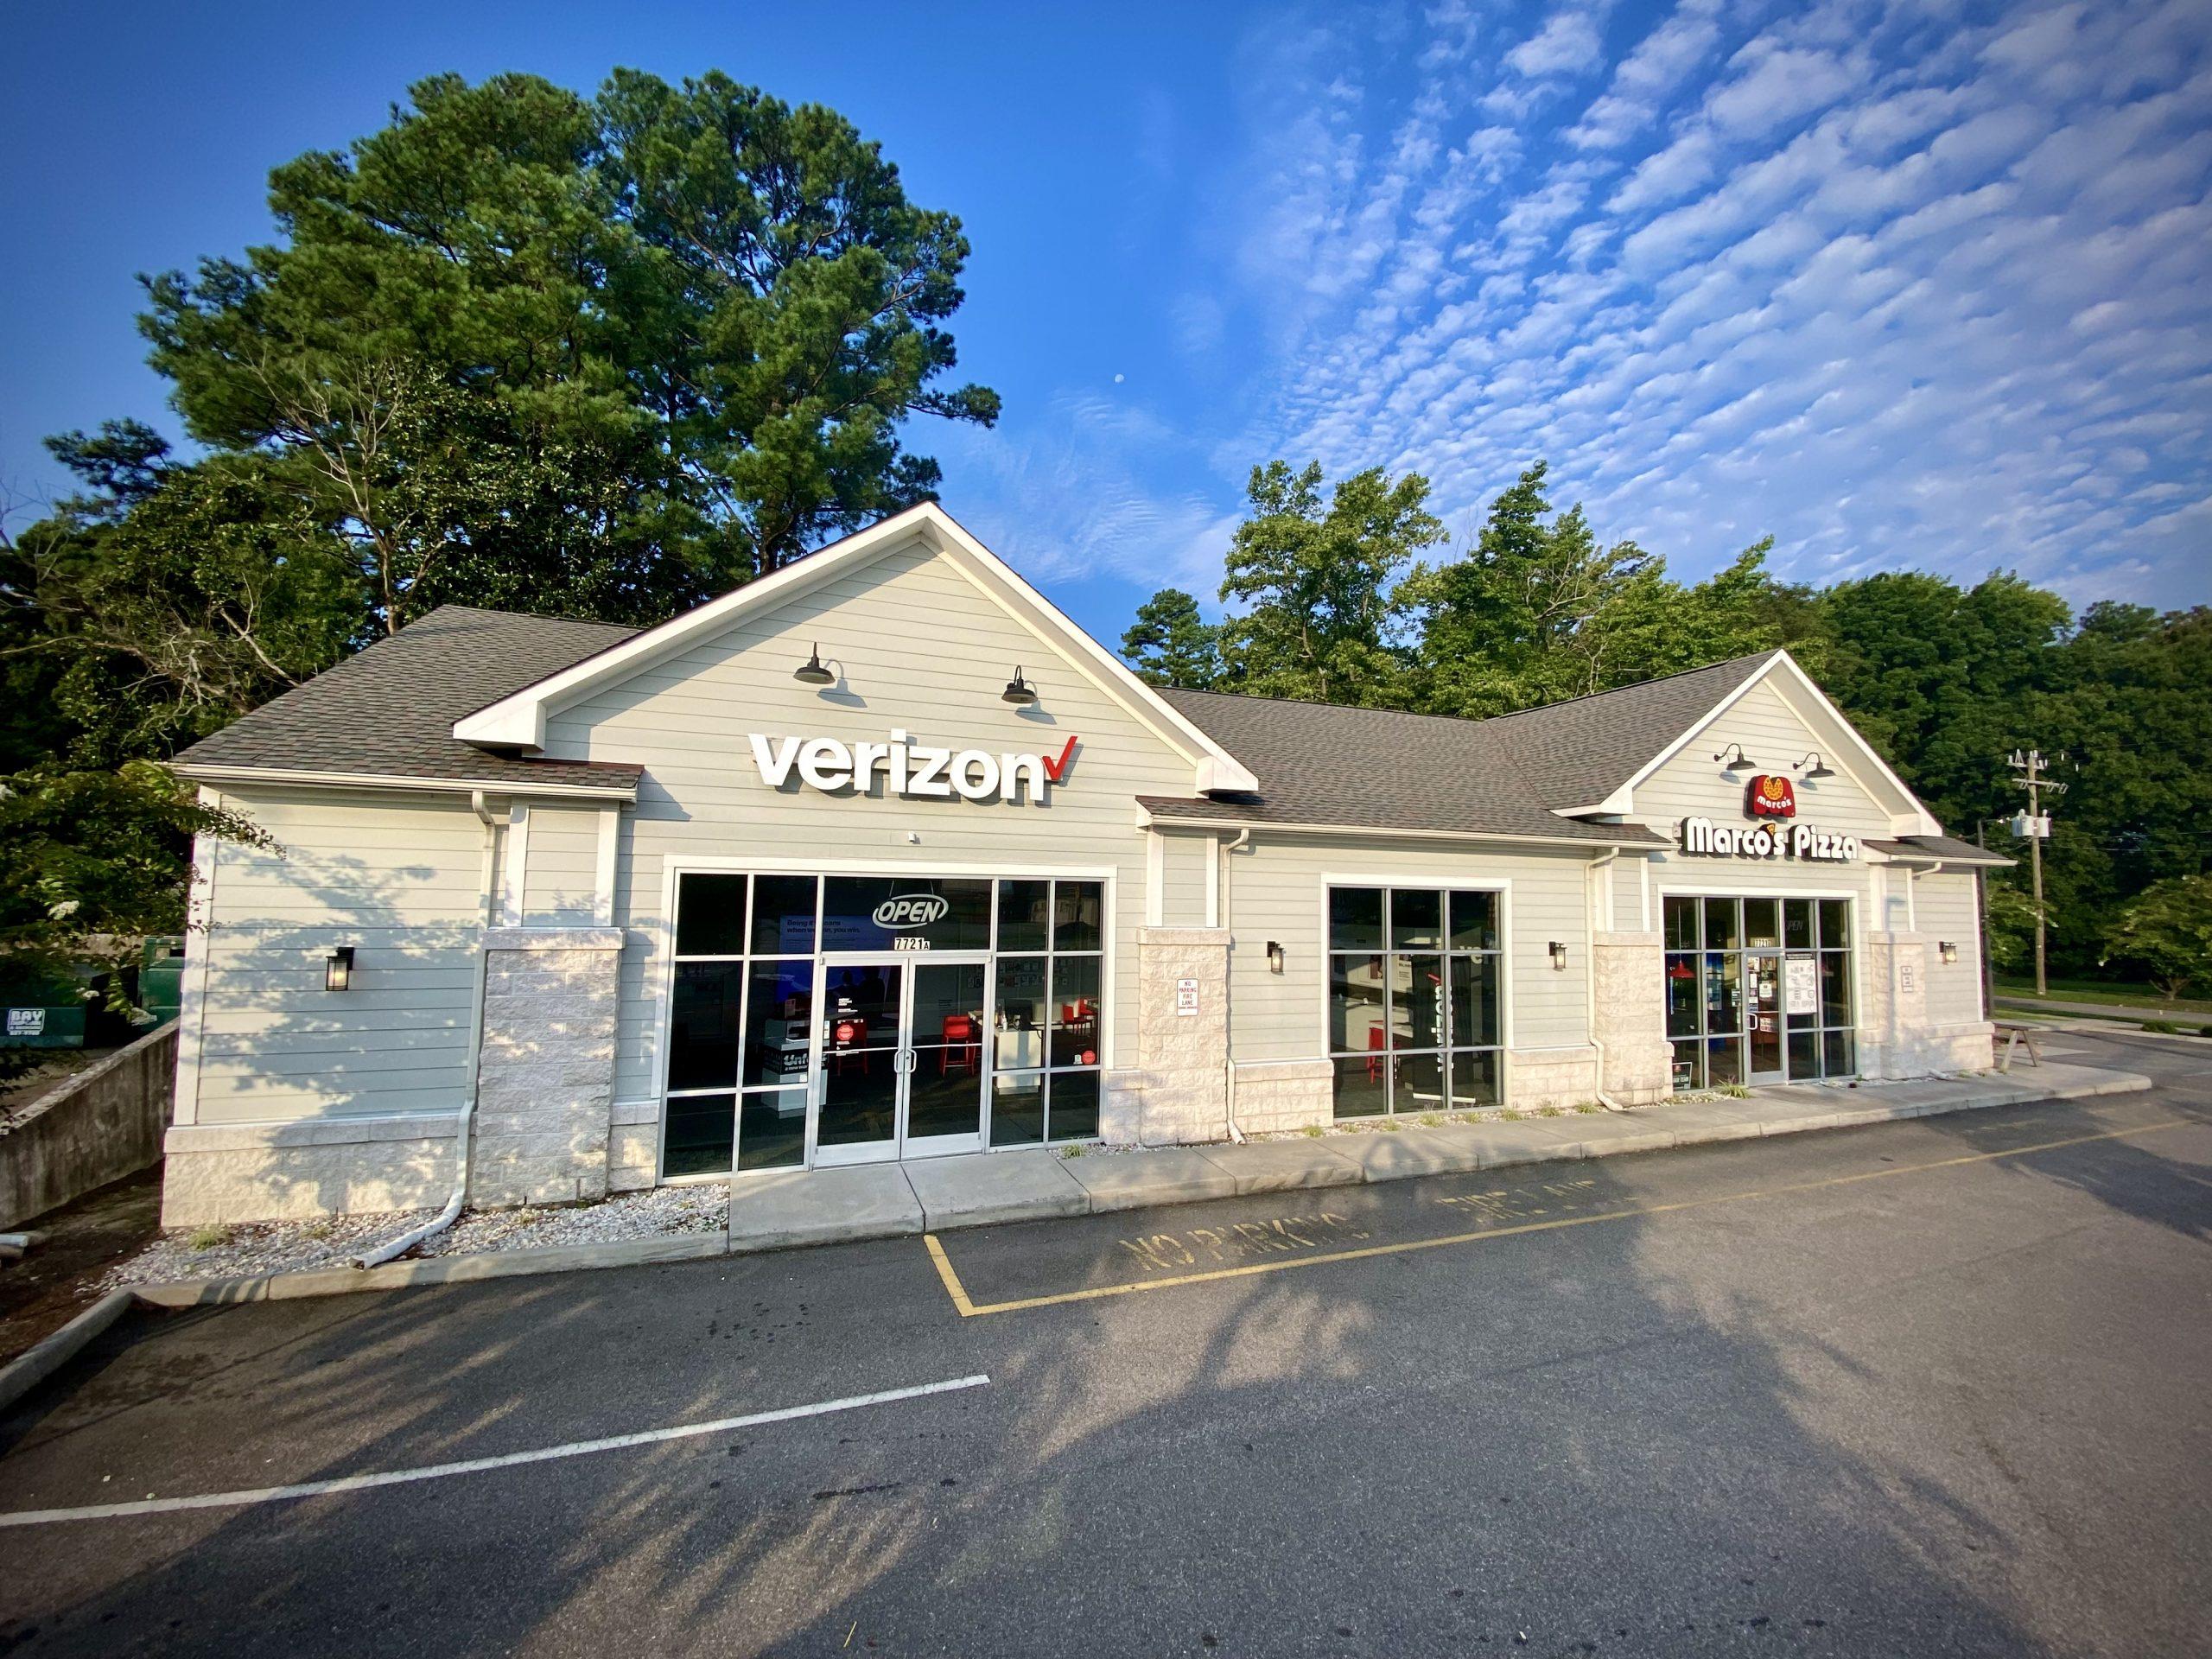 Verizon and Marco's Pizza building exterior on Hampton Blvd in Norfolk